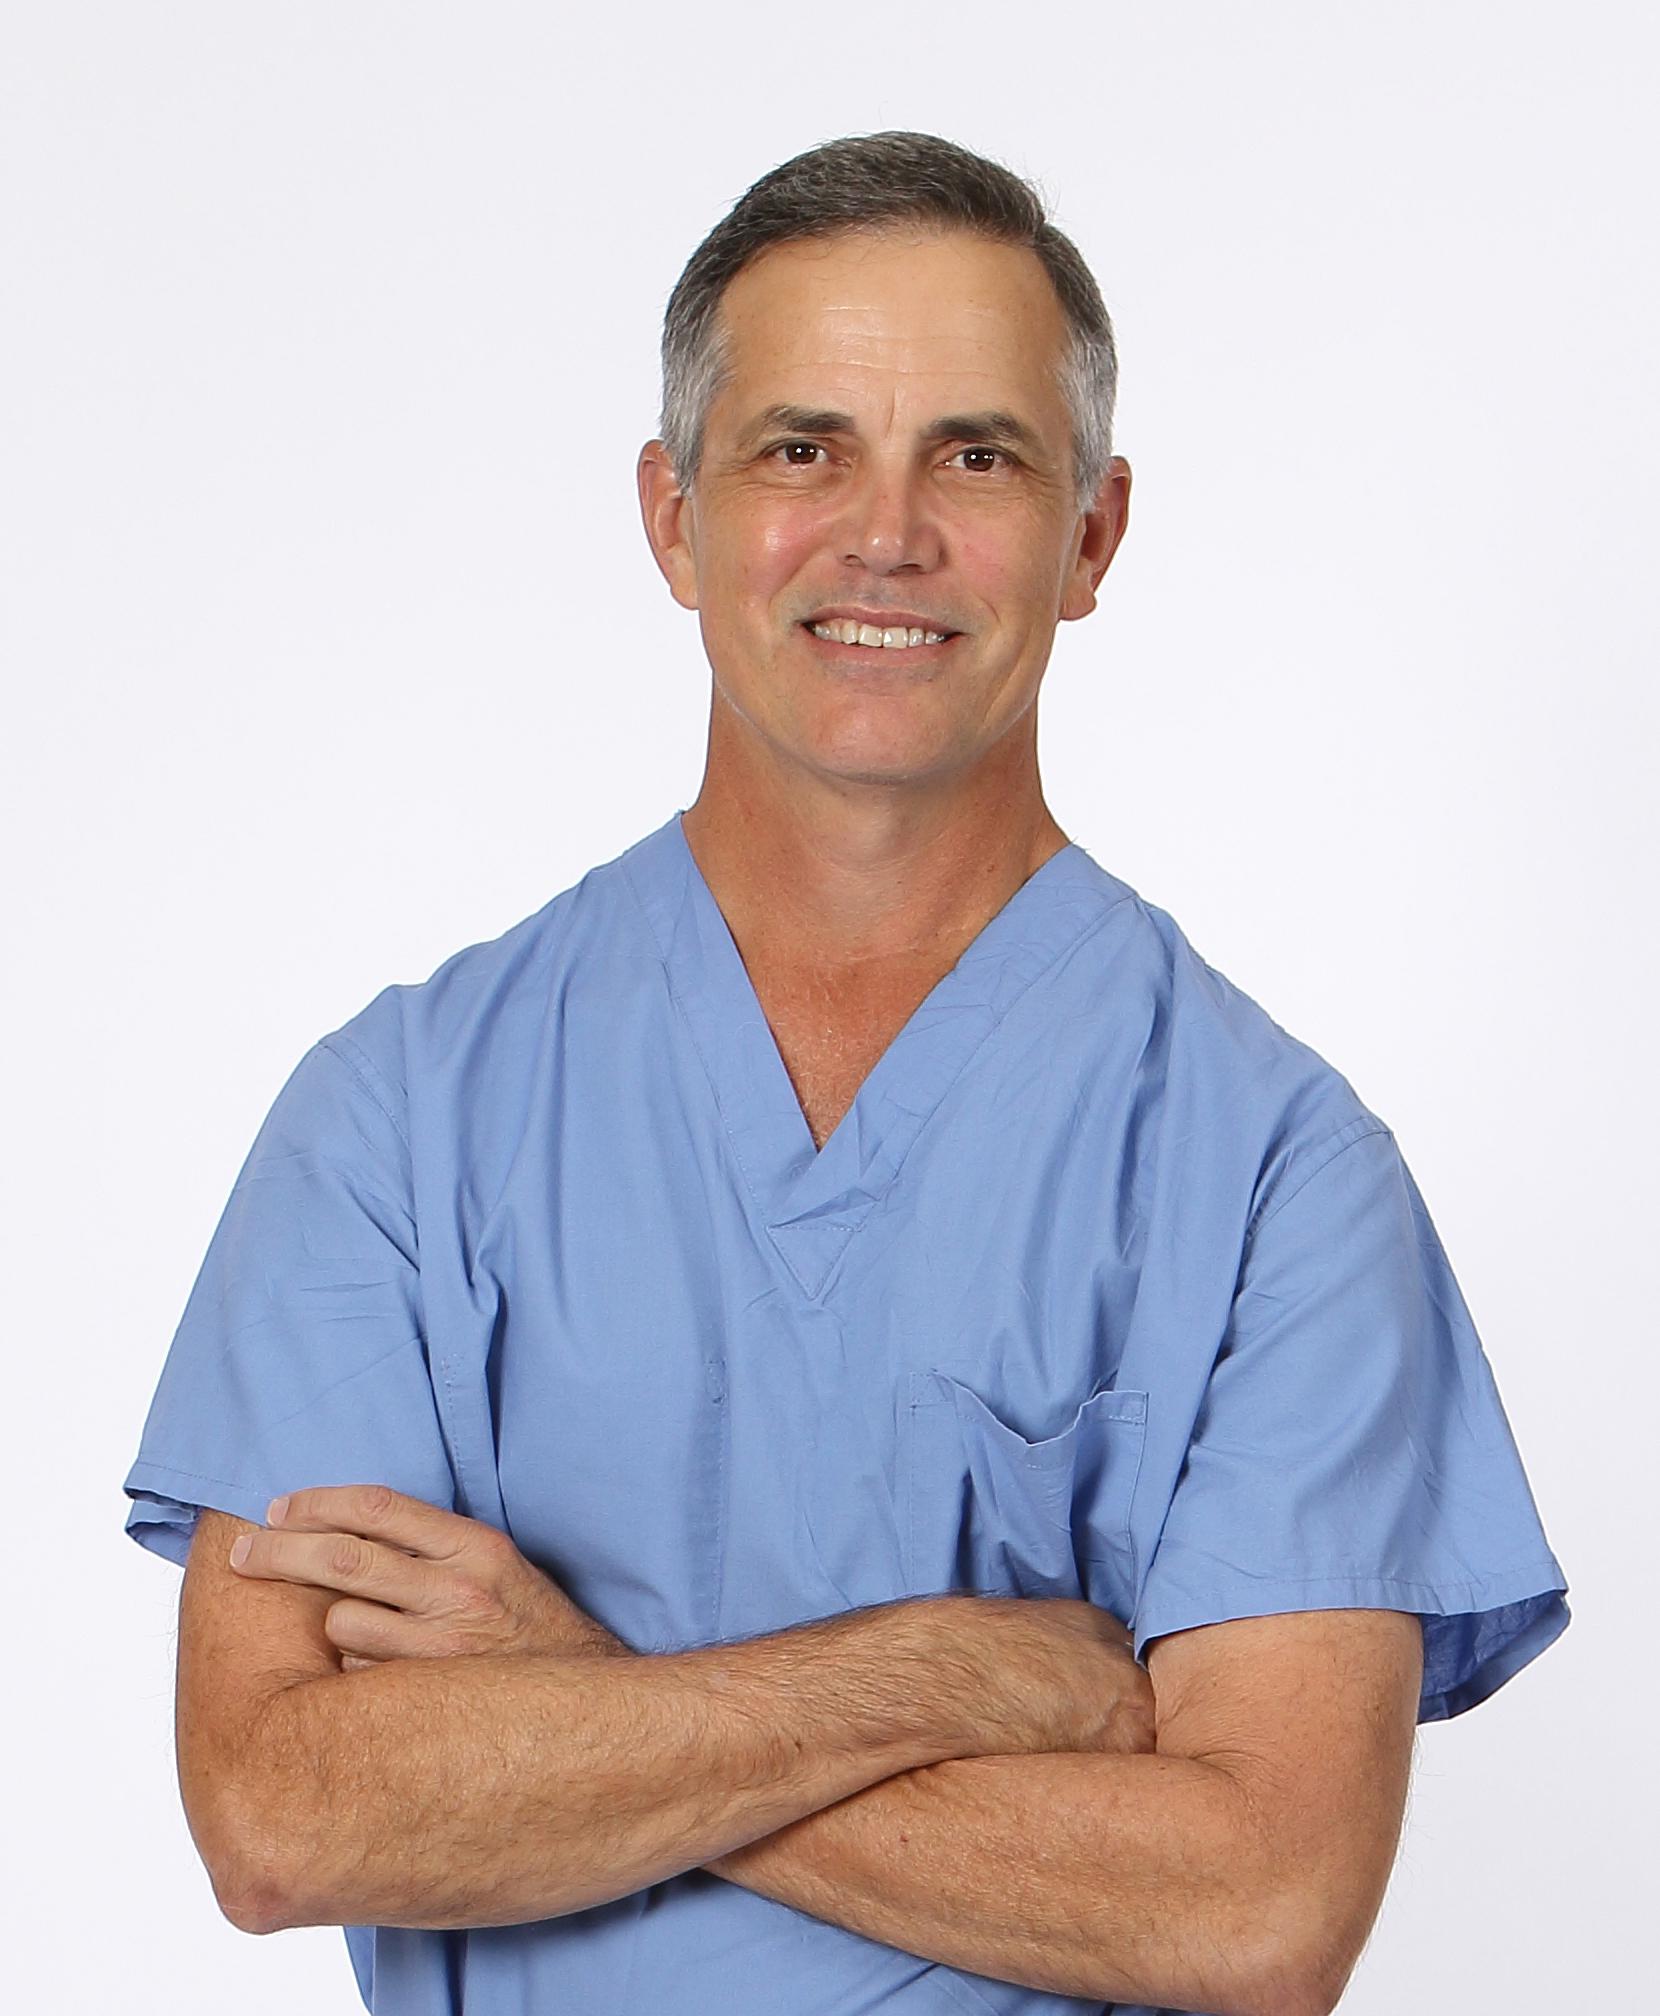 Dr. DiSclafani